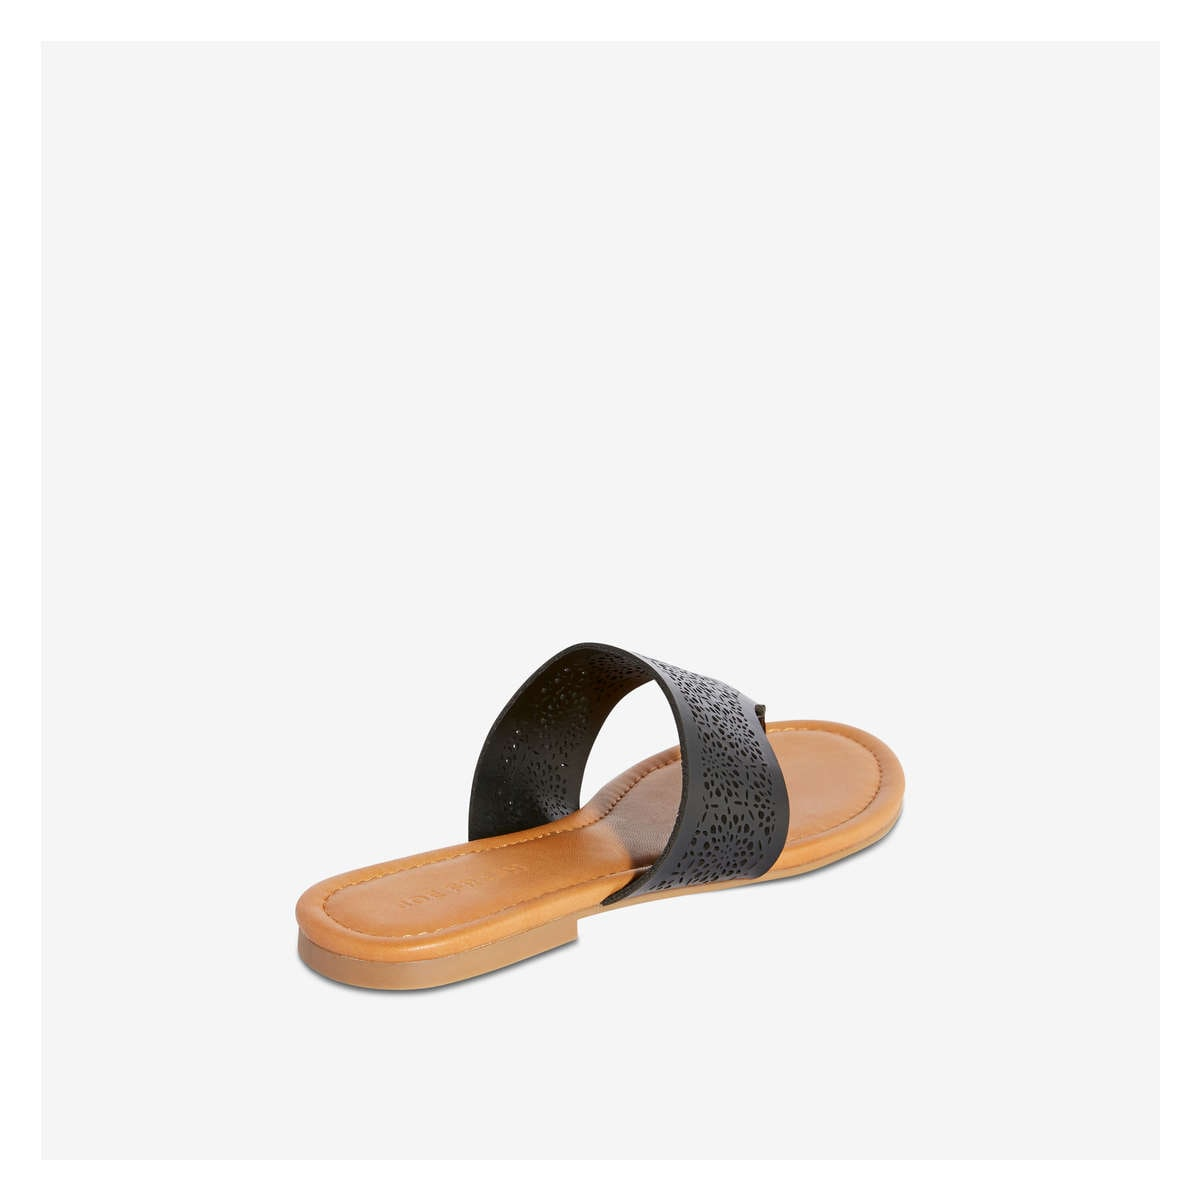 dc2c9169881 Laser Cut-Out Thong Sandal in Black from Joe Fresh